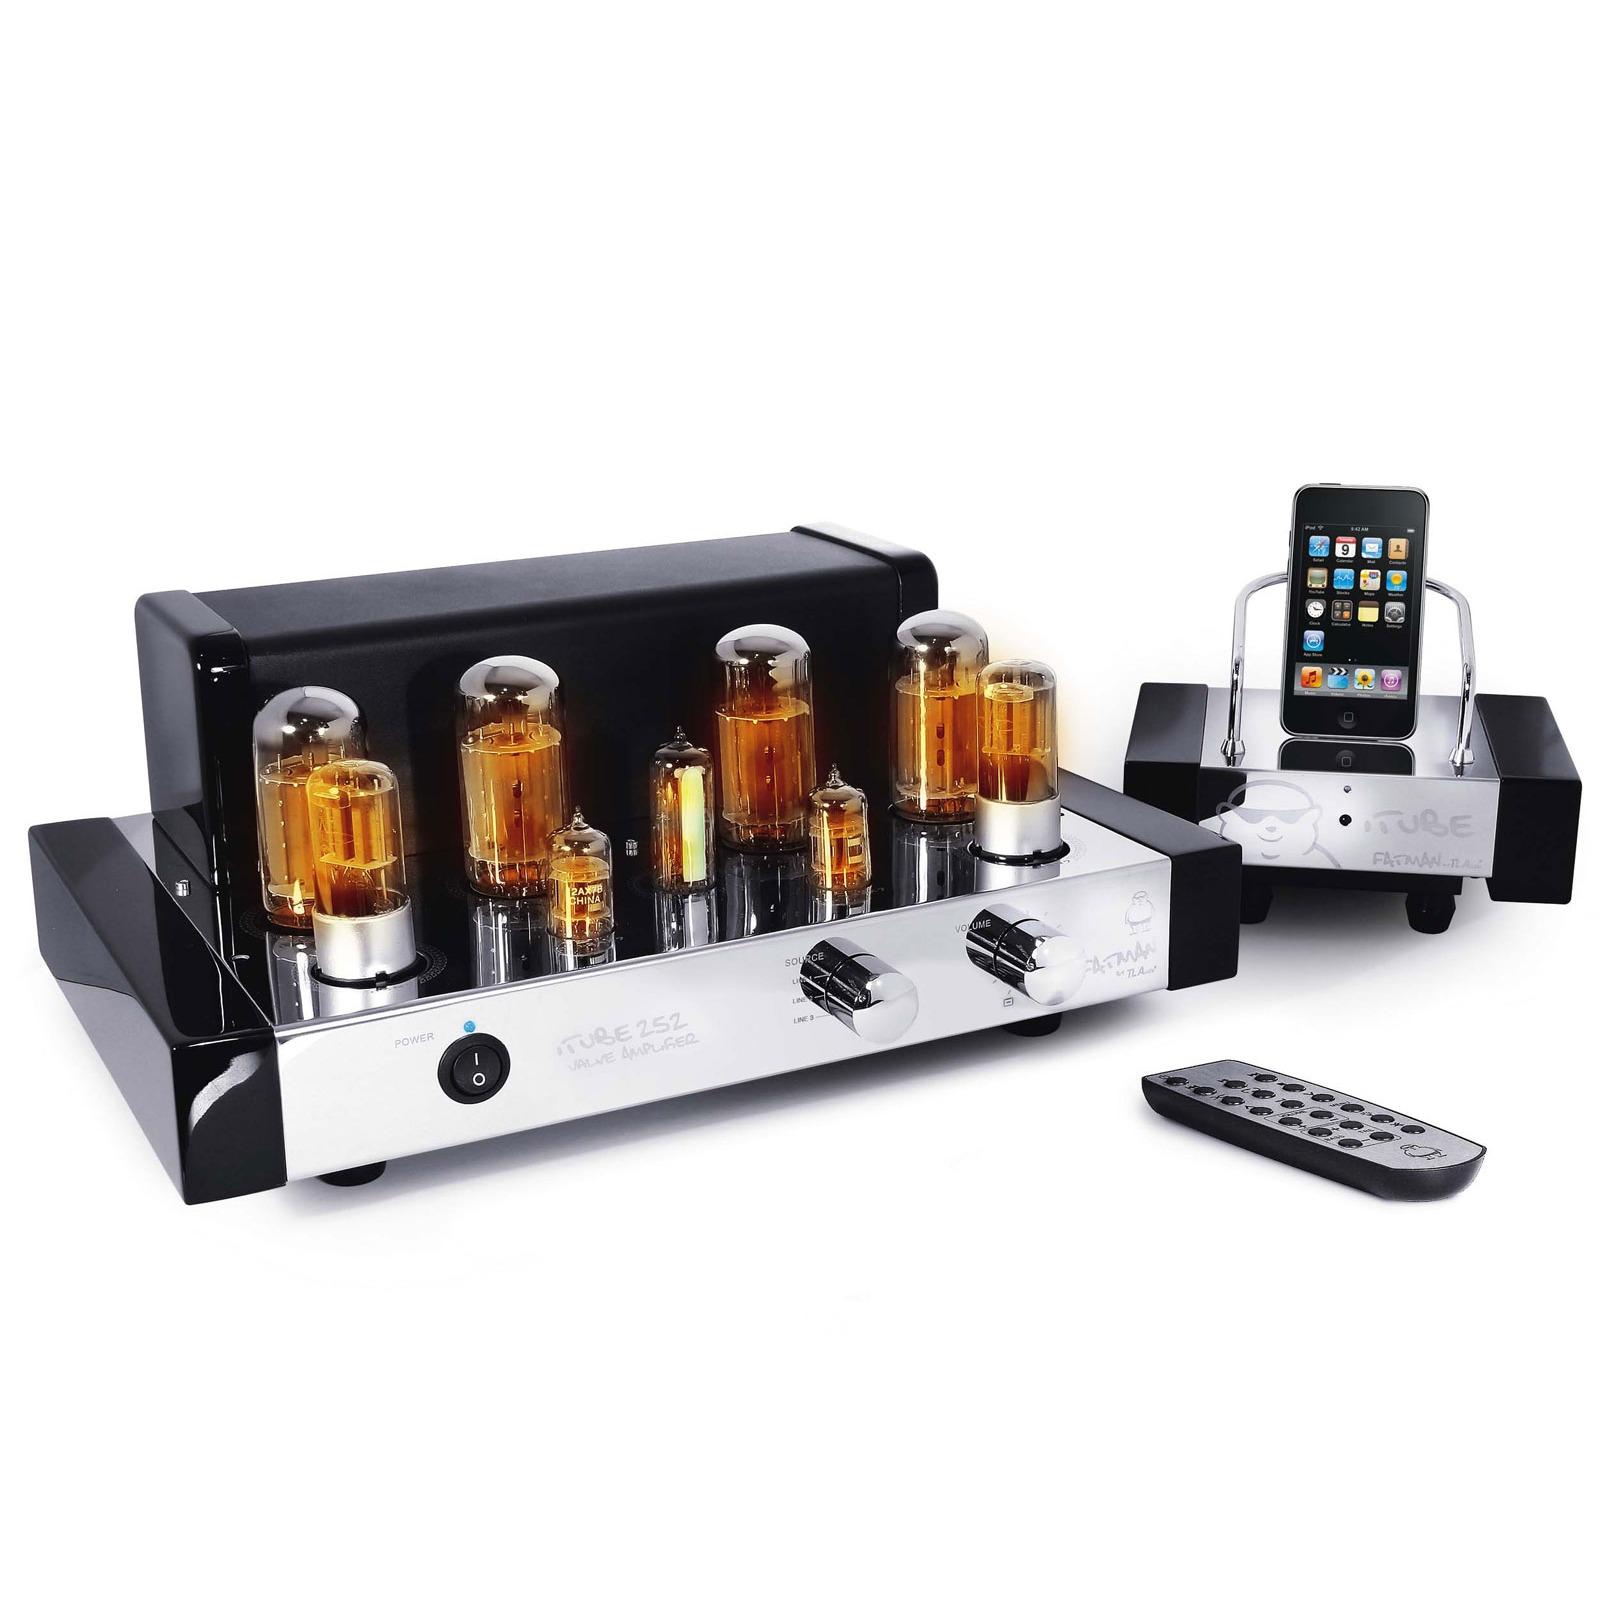 fatman itube 252 amplificateur hifi fatman sur. Black Bedroom Furniture Sets. Home Design Ideas